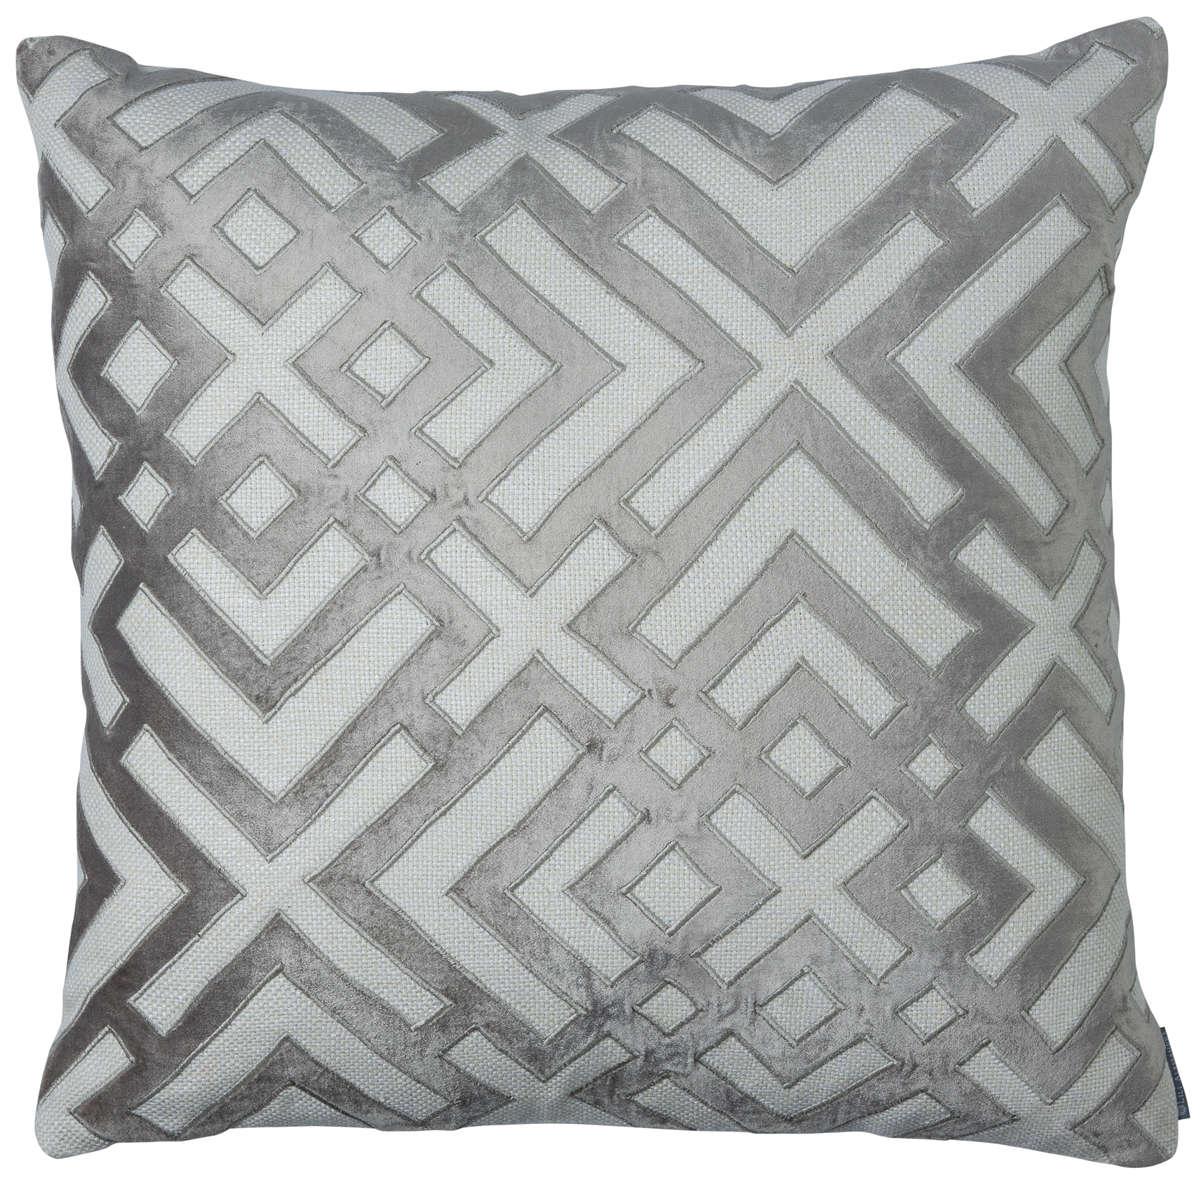 Lili Alessandra Karl Ivory/Platinum Pillow